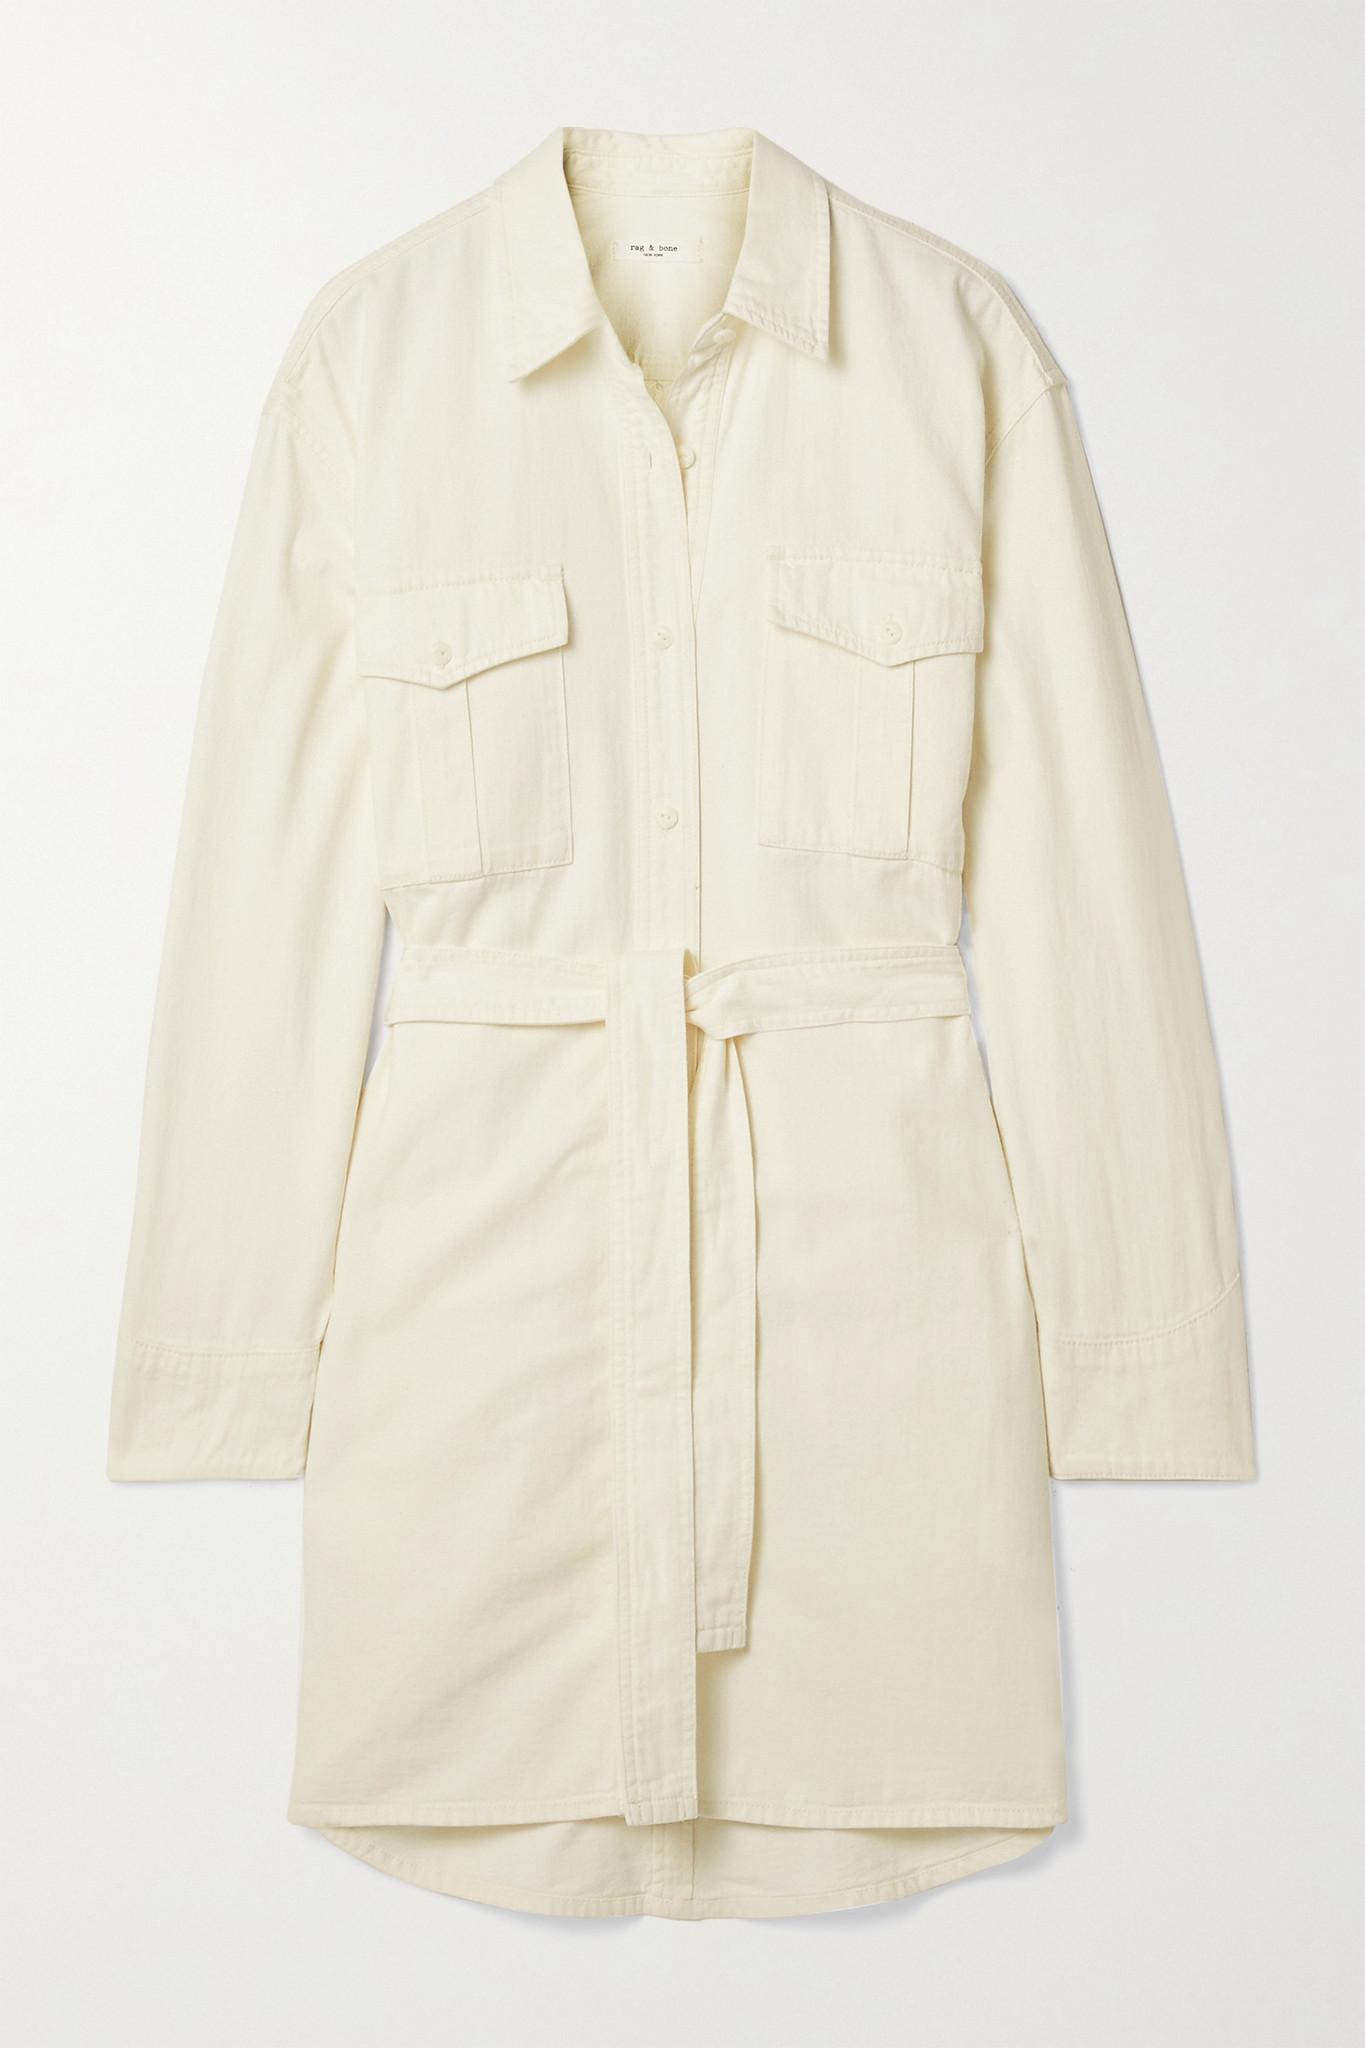 RAG & BONE - 配腰带衬衫式牛仔连衣裙 - 米白色 - large